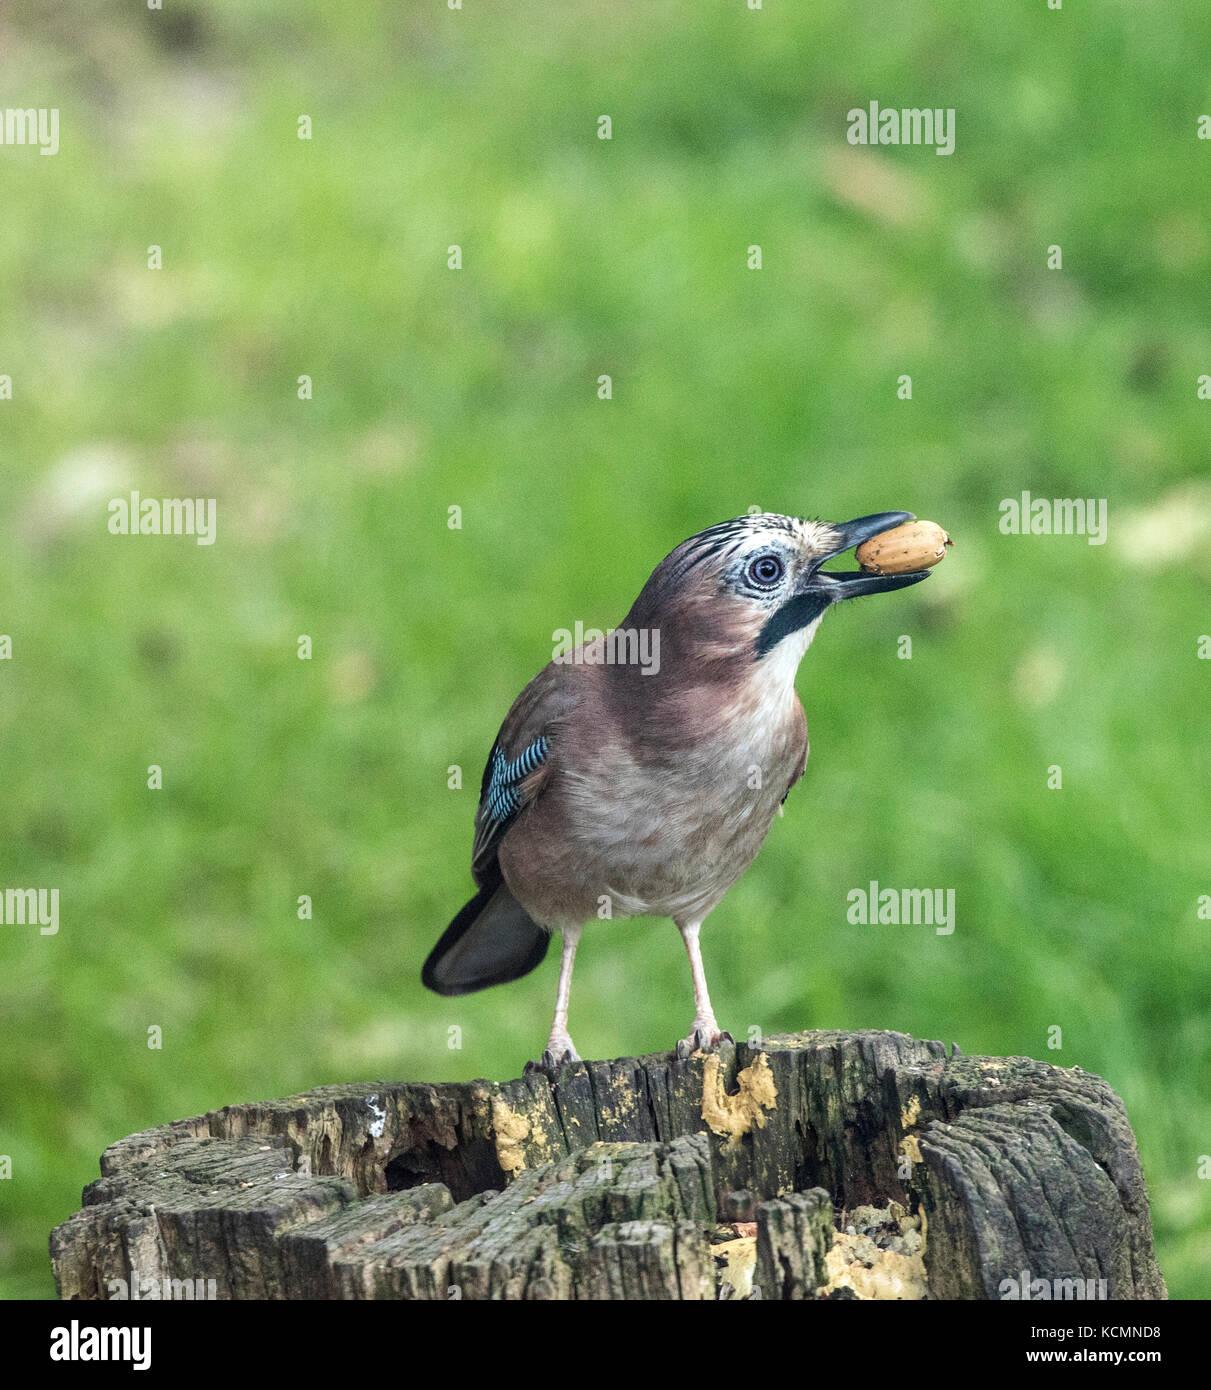 Jay Garrulus glandarius feeding on acorns - Stock Image